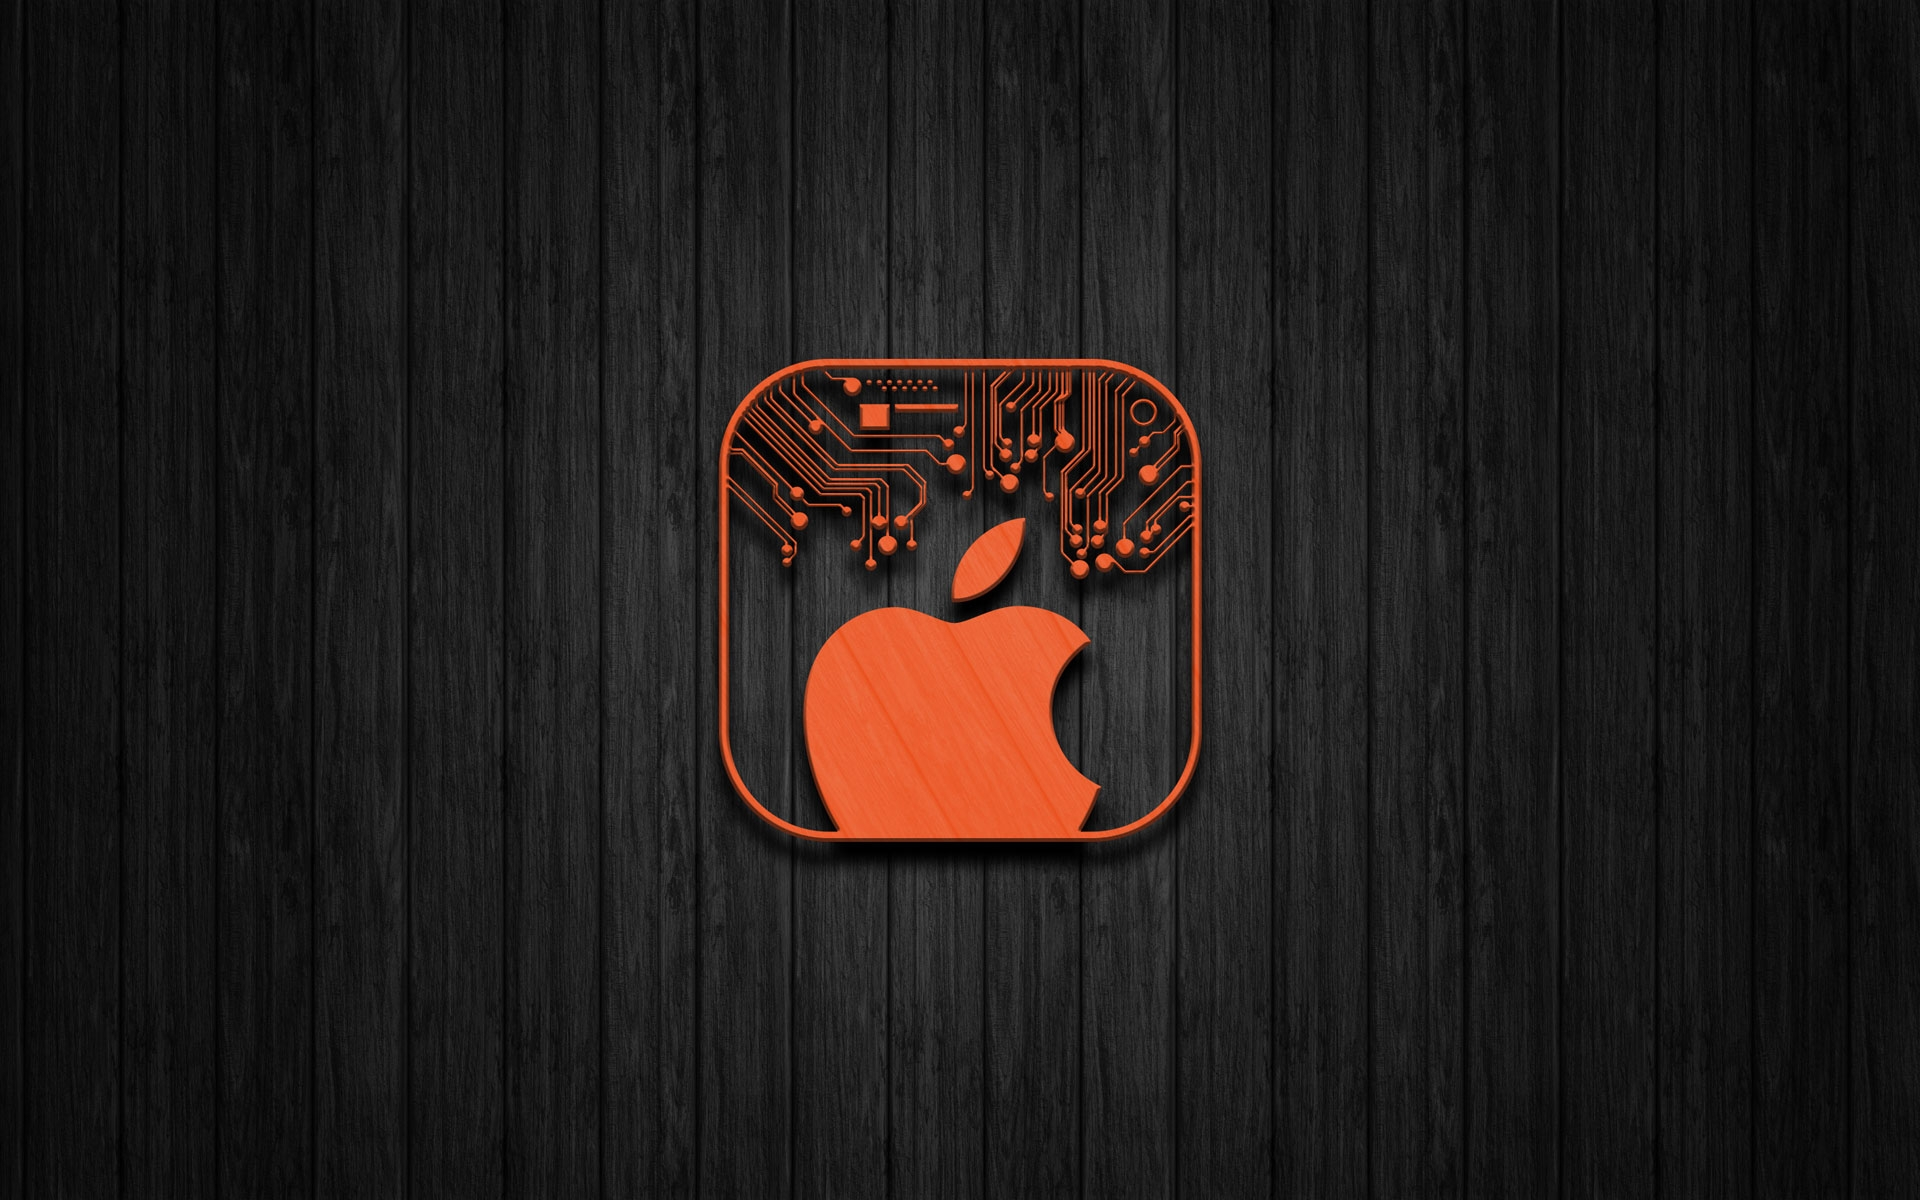 placa-macbook-apple-alphamac-banner2